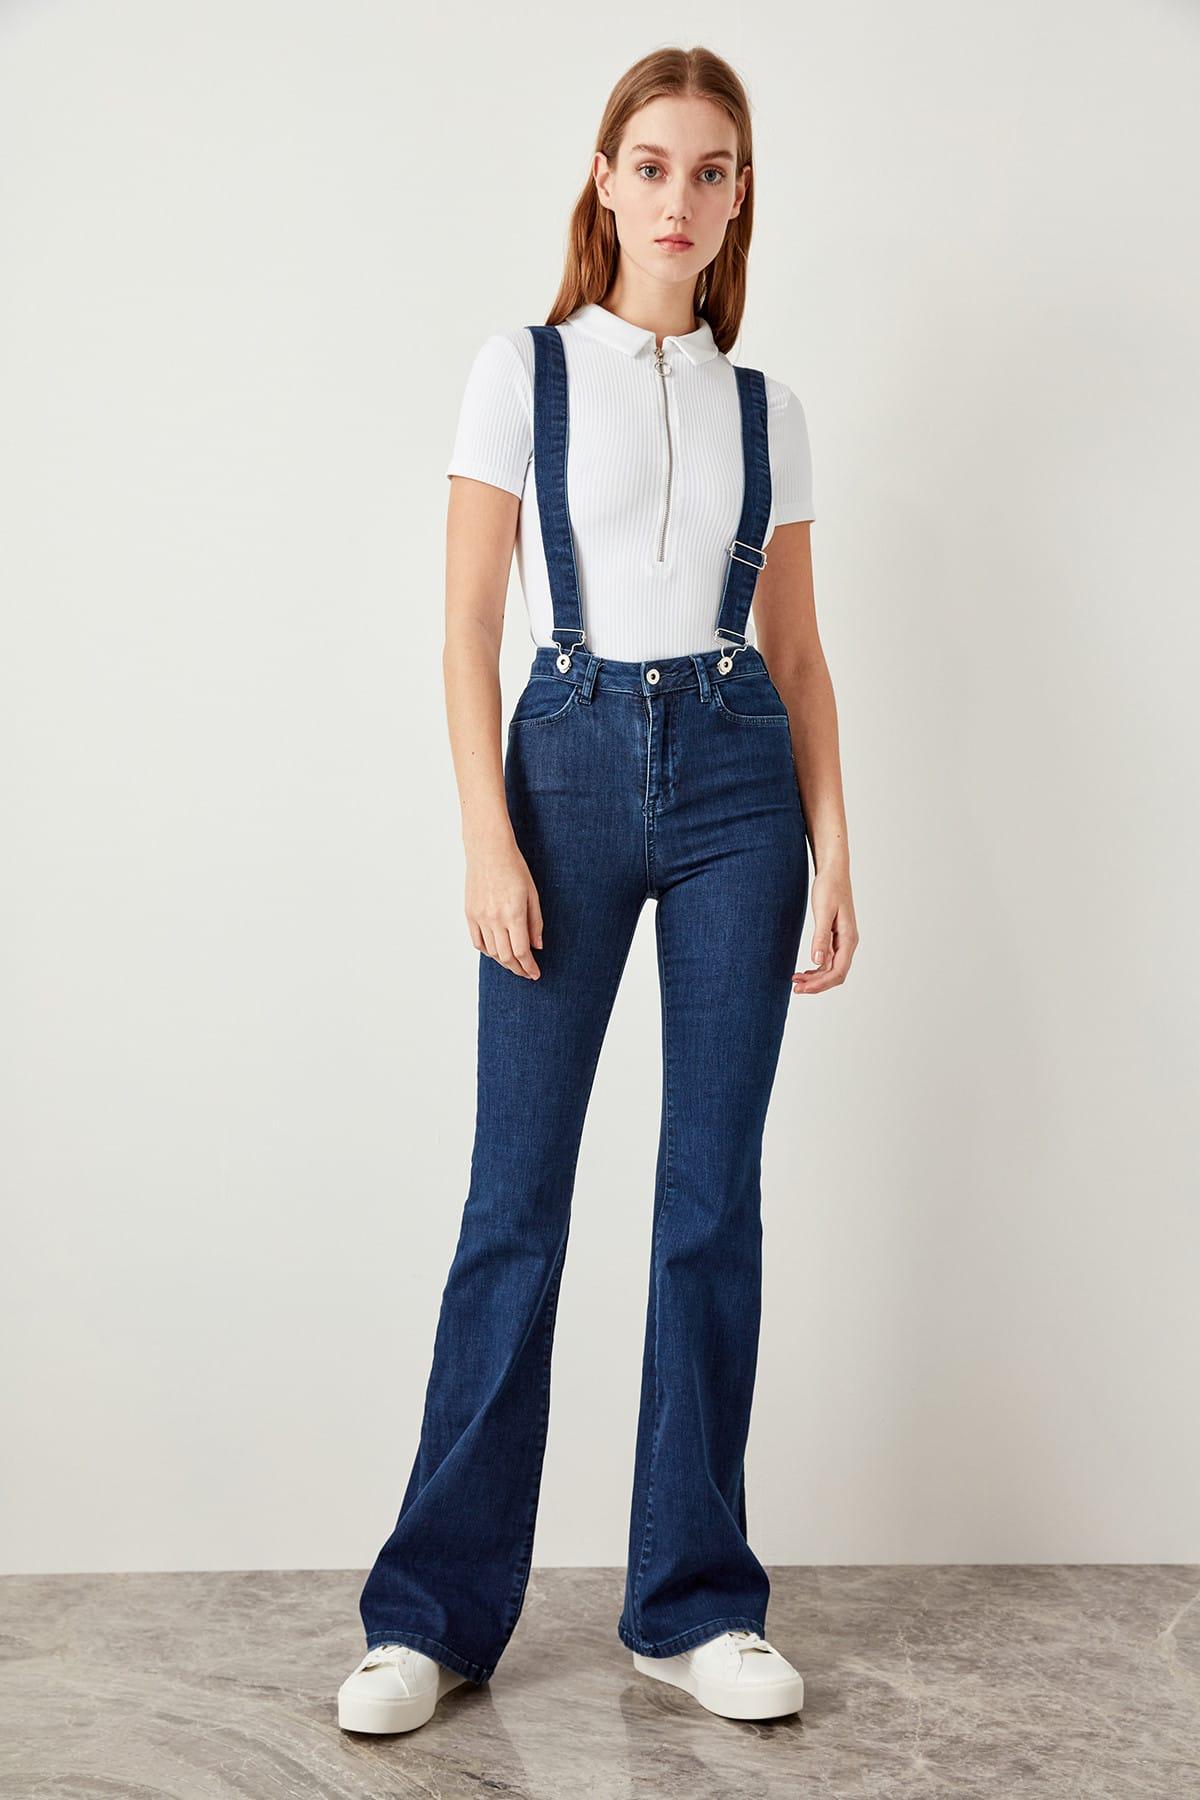 Trendyol Navy Blue Clip-on High Waist Flare Jeans